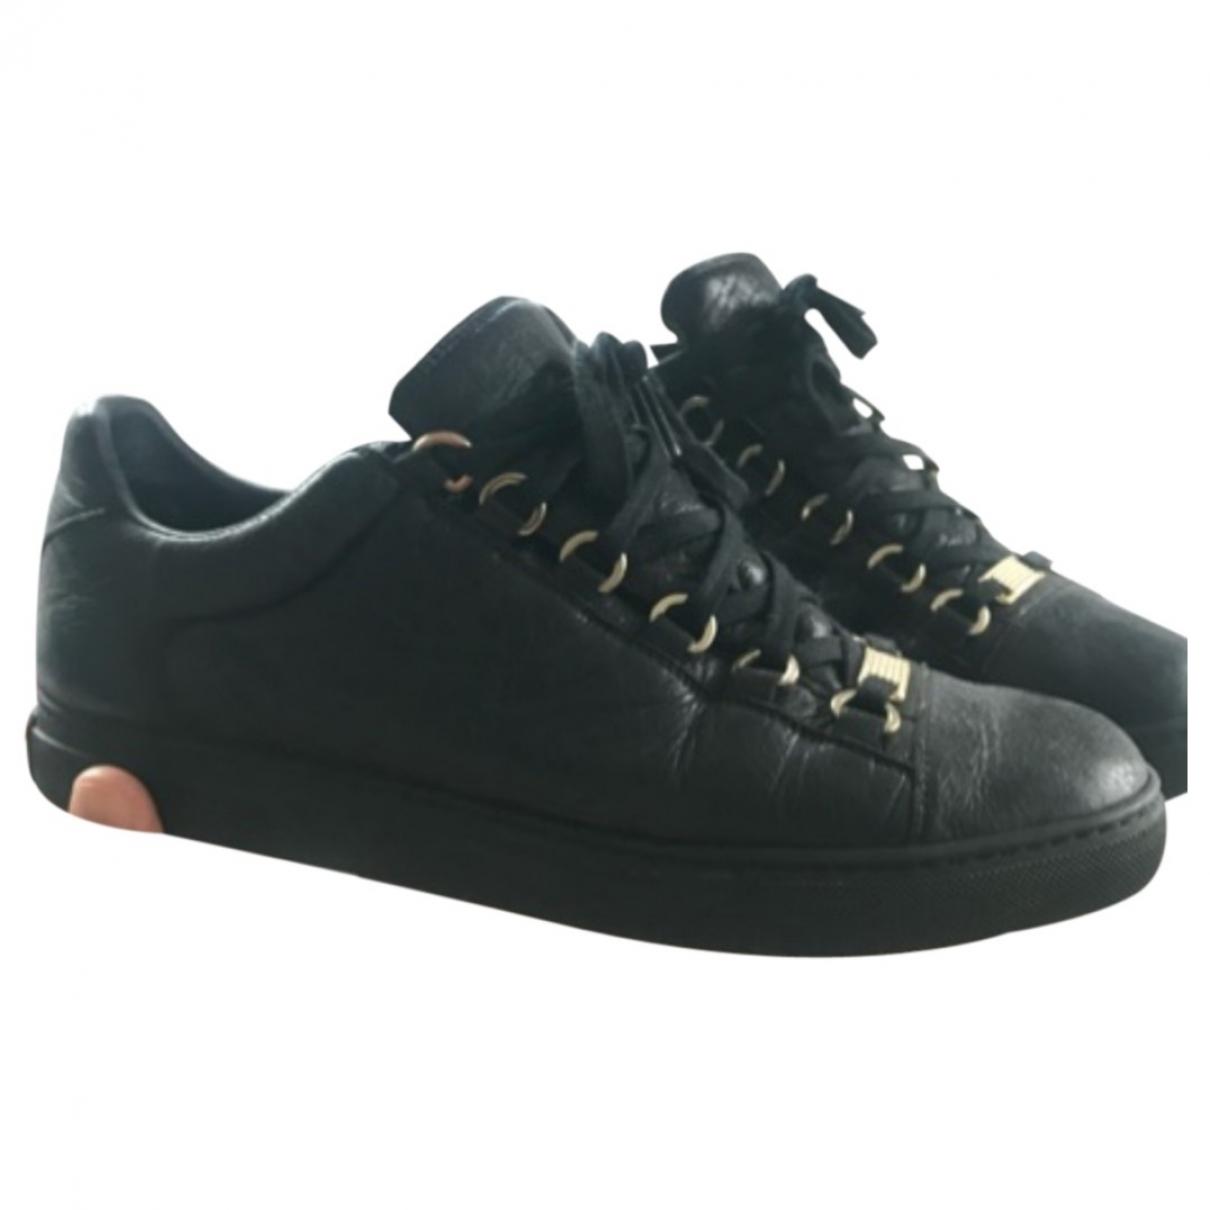 Balenciaga Arena Black Leather Trainers for Men 40 EU